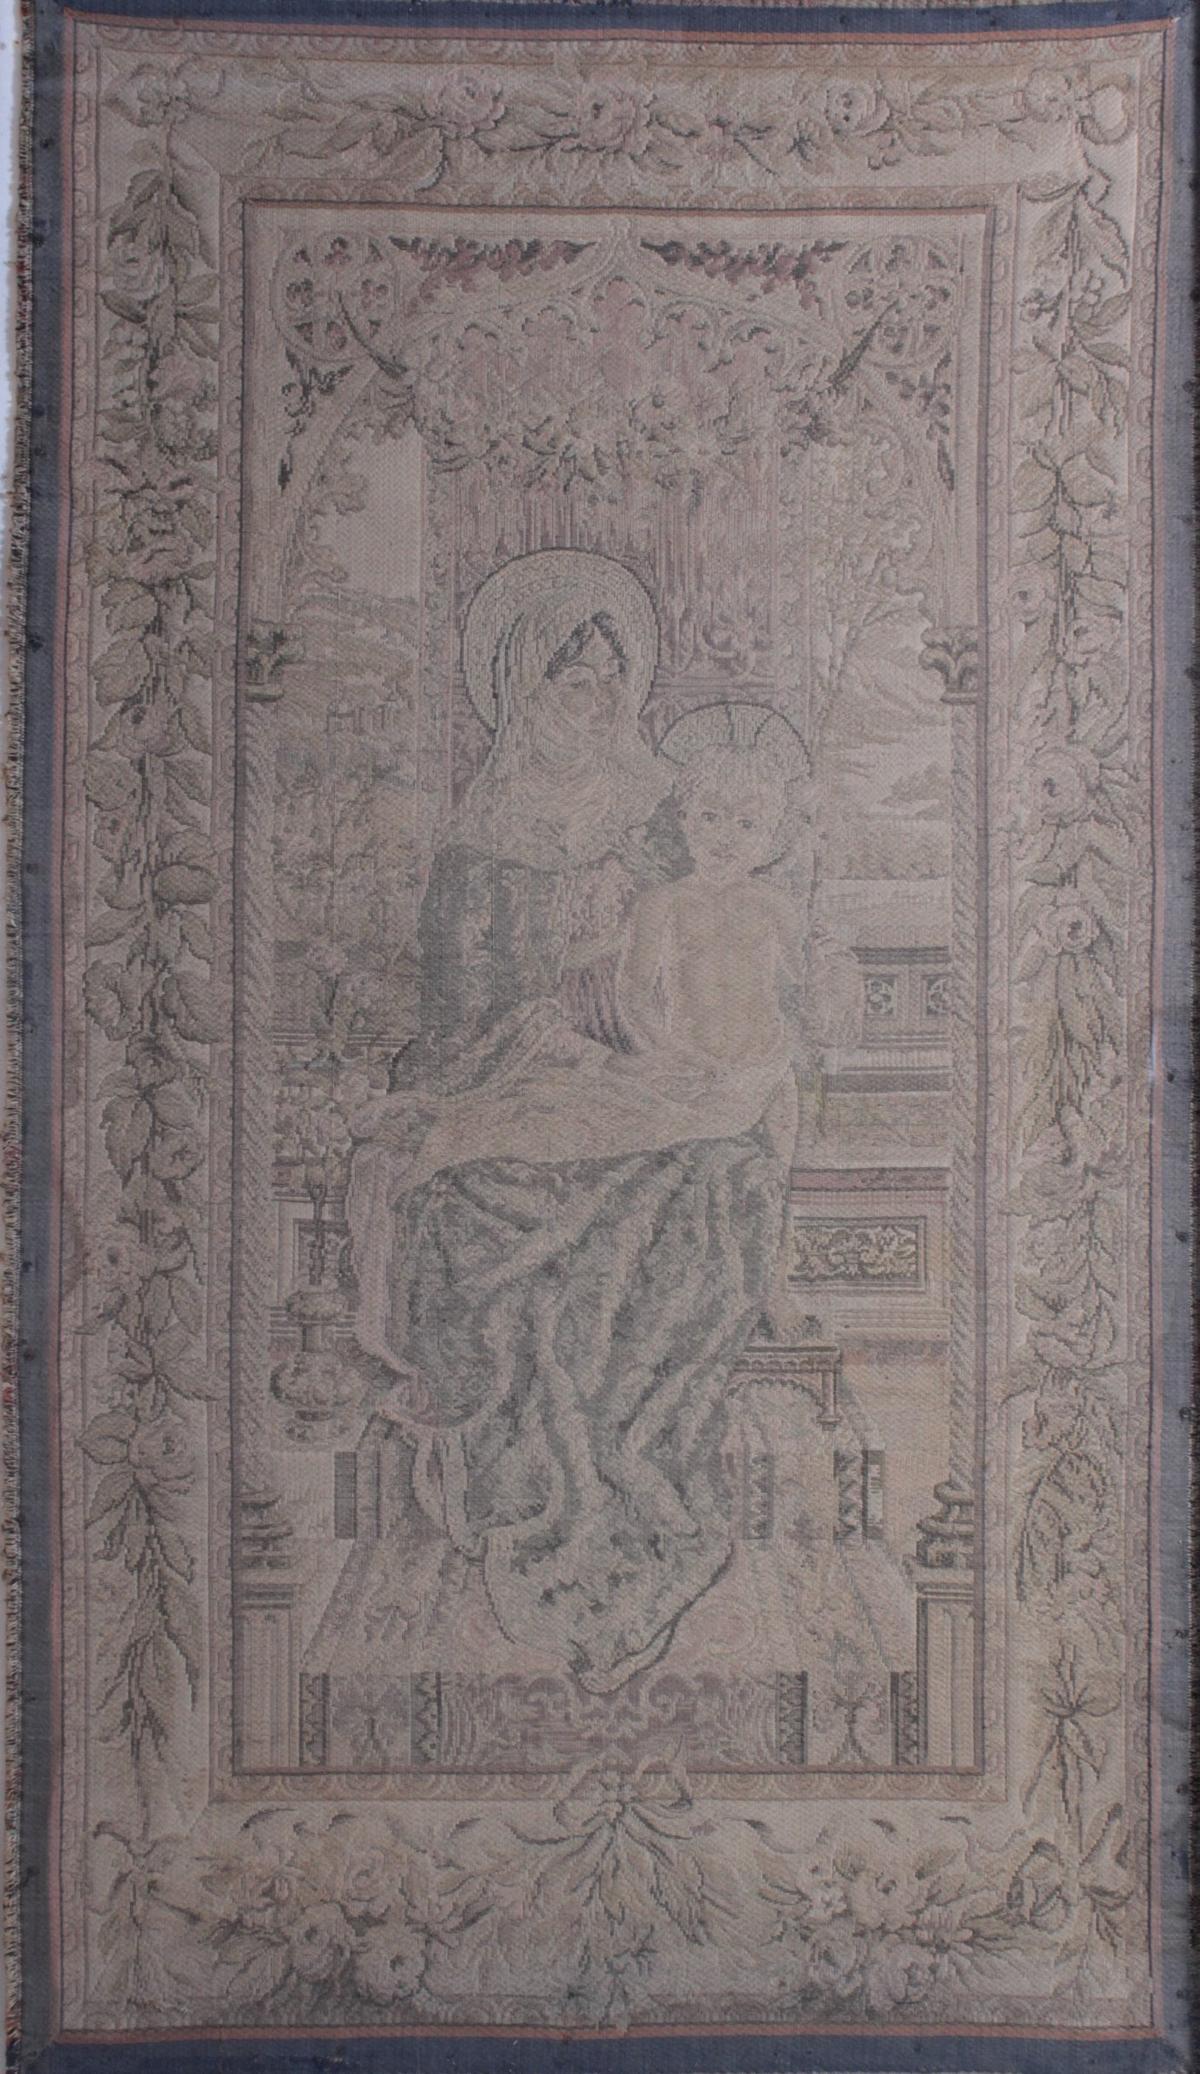 Religiöser Gobelin, 19. Jahrhundert-2